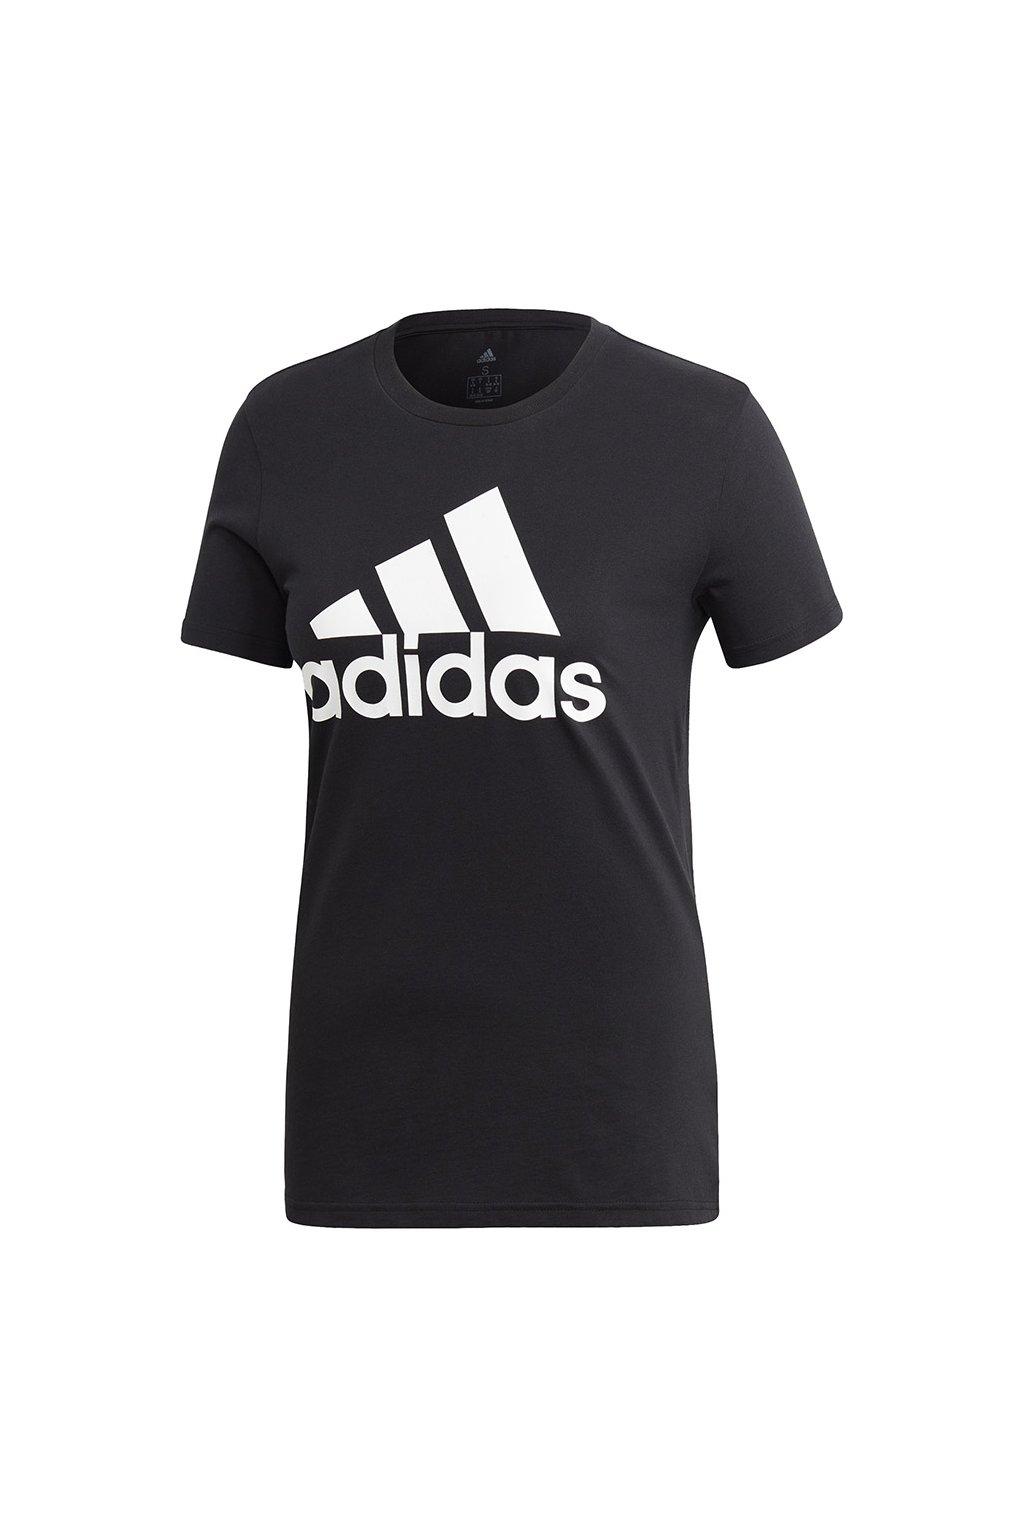 Dámske tričko adidas Badge of Sports čierne FQ3237